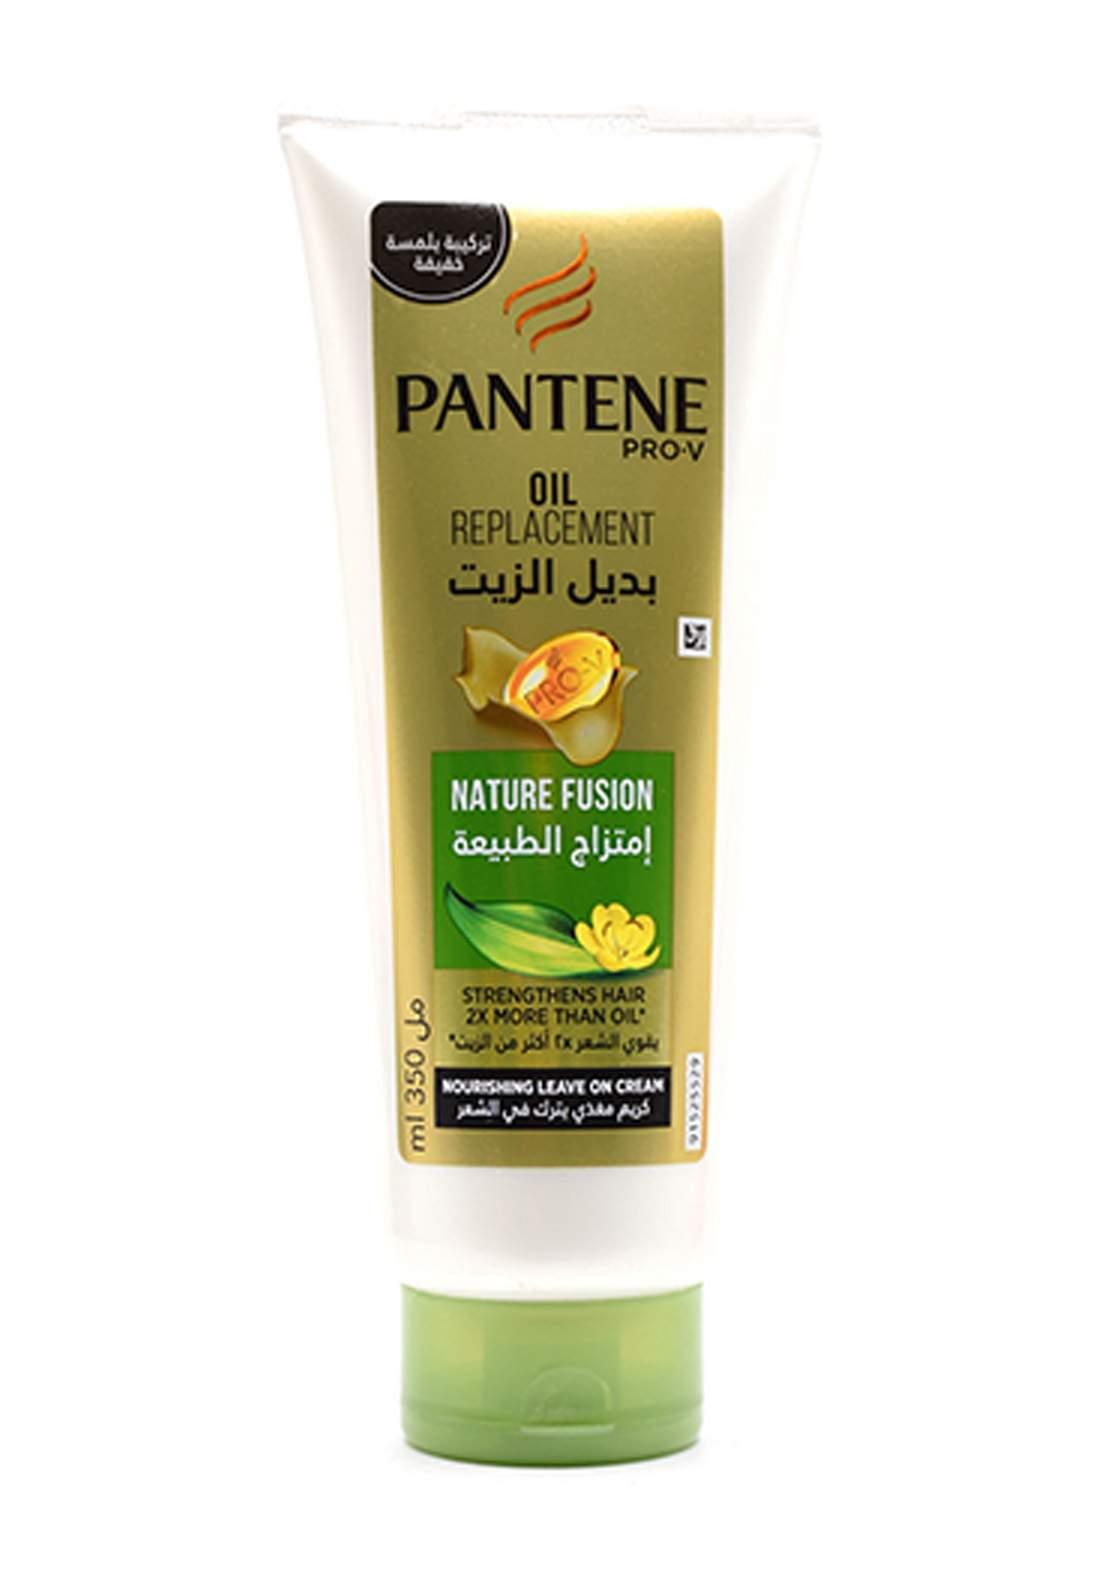 Pantene Oil Replacement Nature Fusion 350 ml كريم بديل الزيت